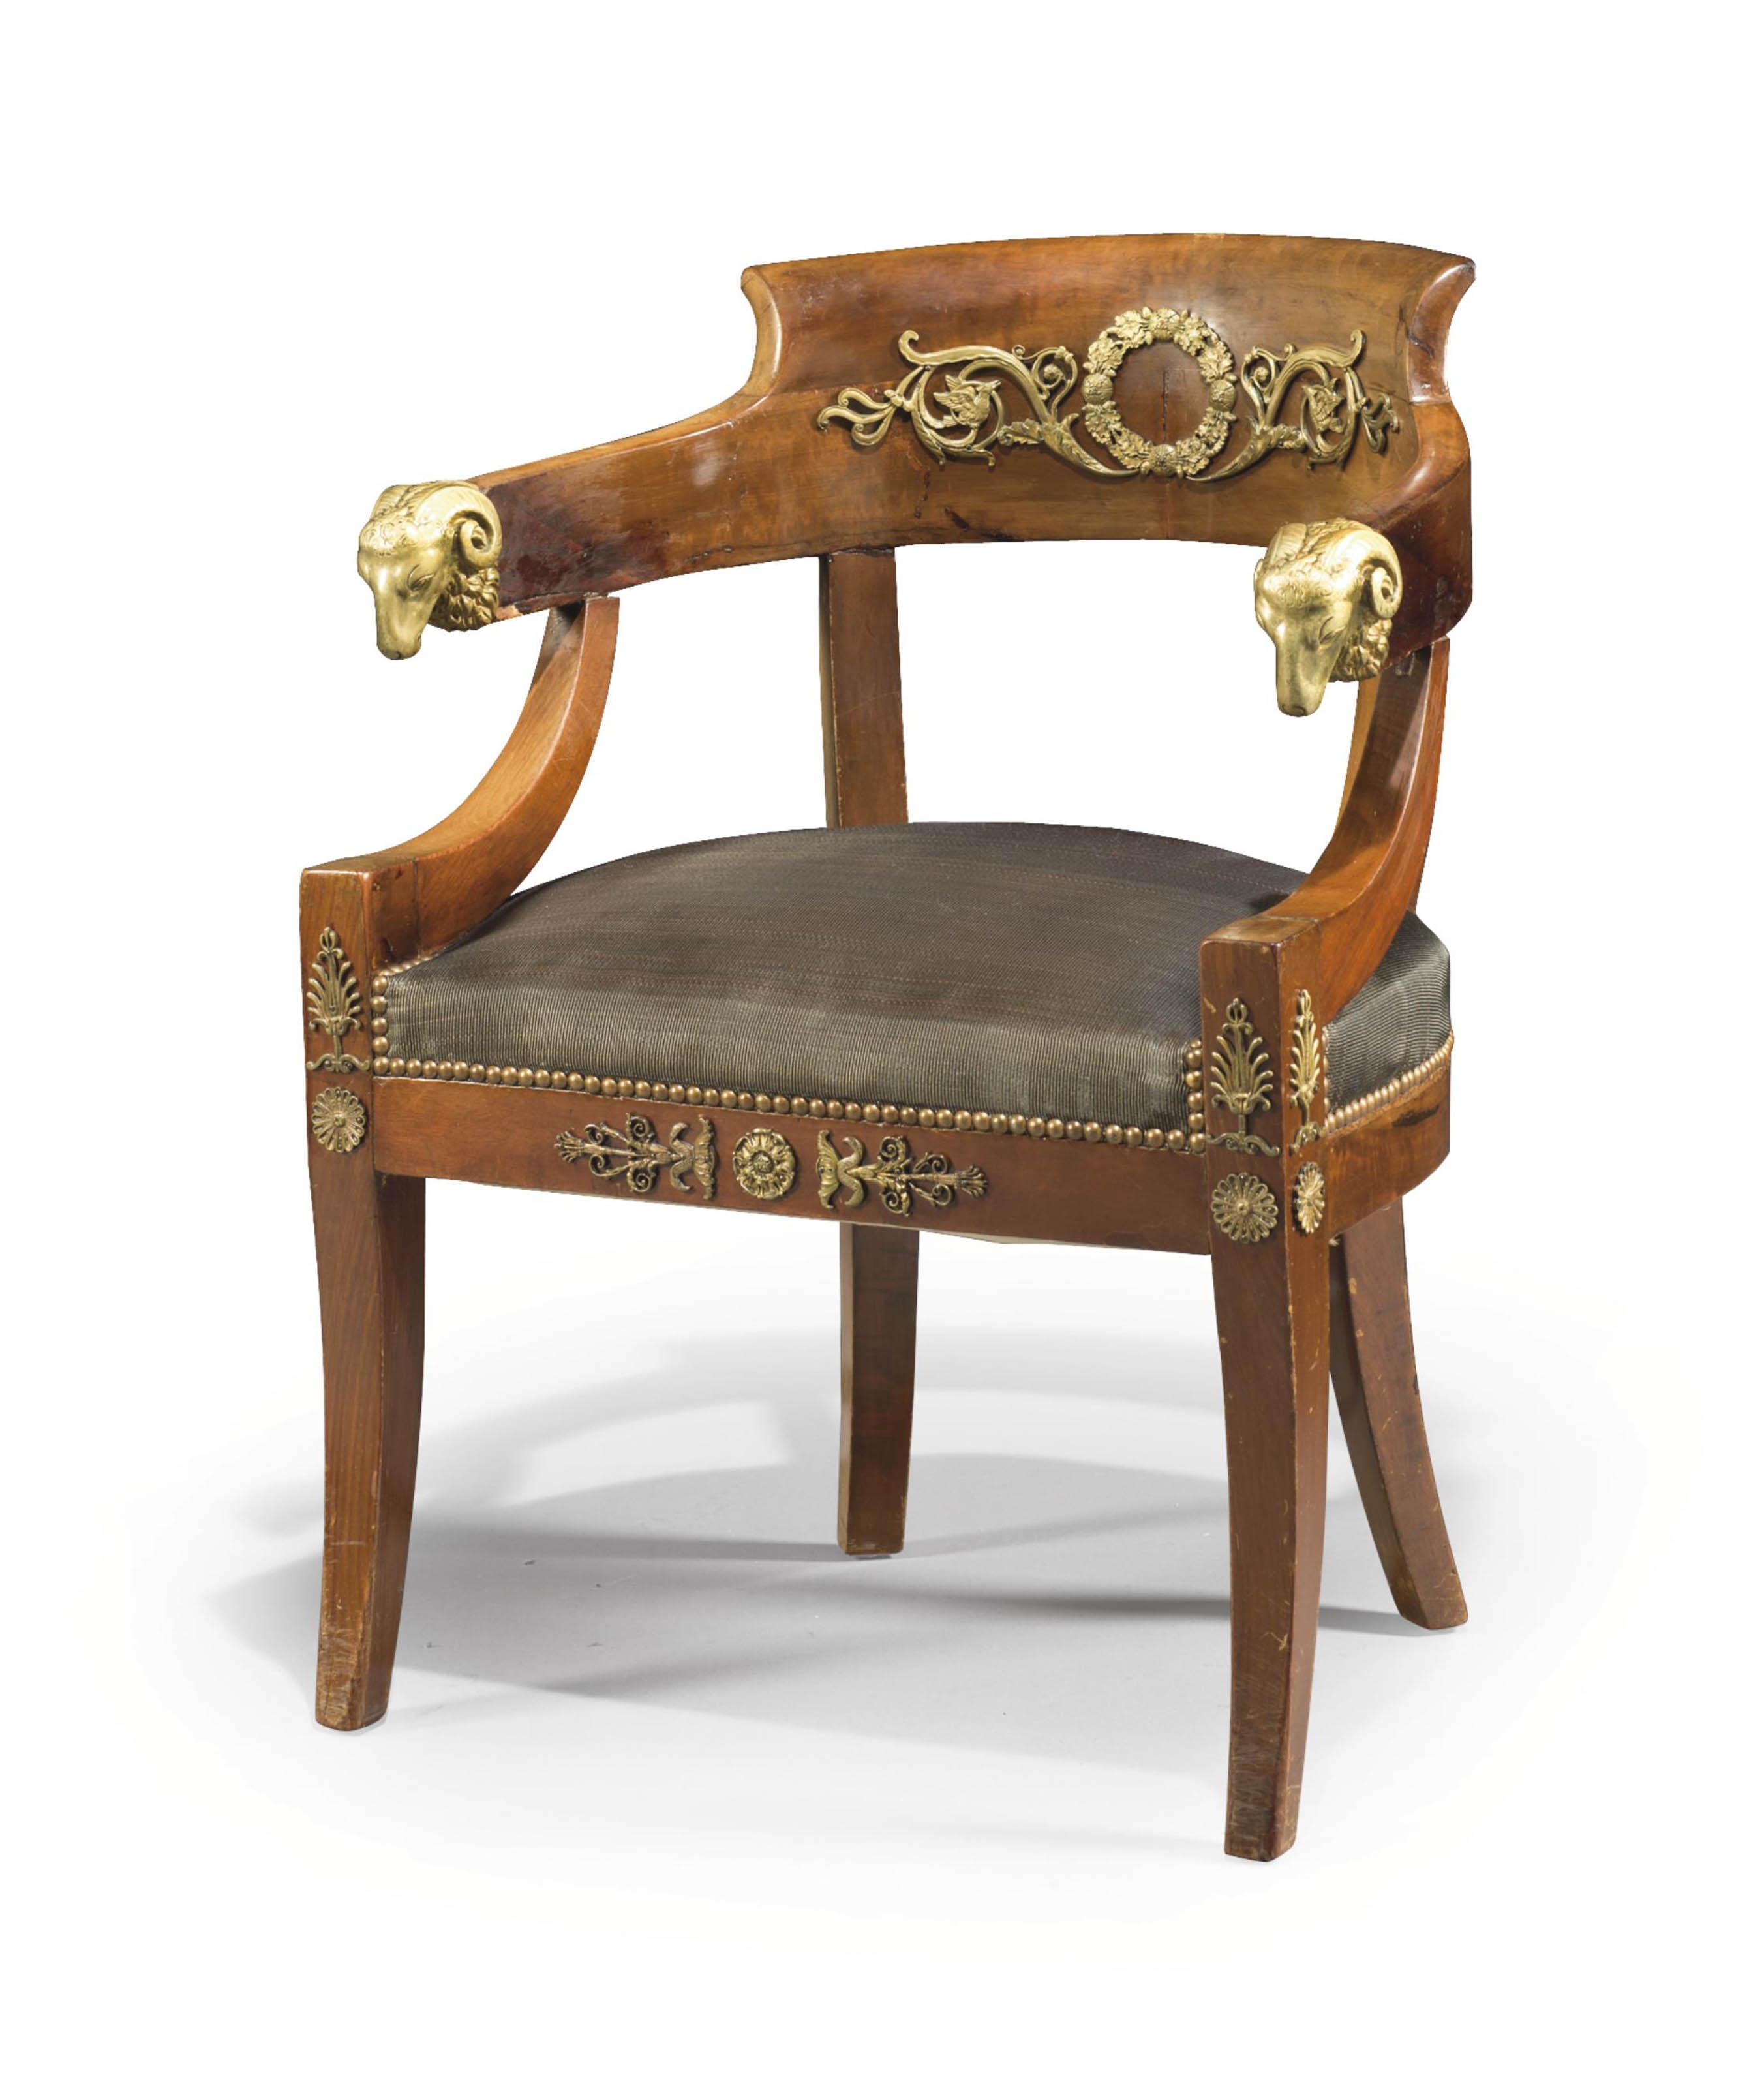 FAUTEUIL DE BUREAU DE STYLE EMPIRE VERS 1900 chair mahogany